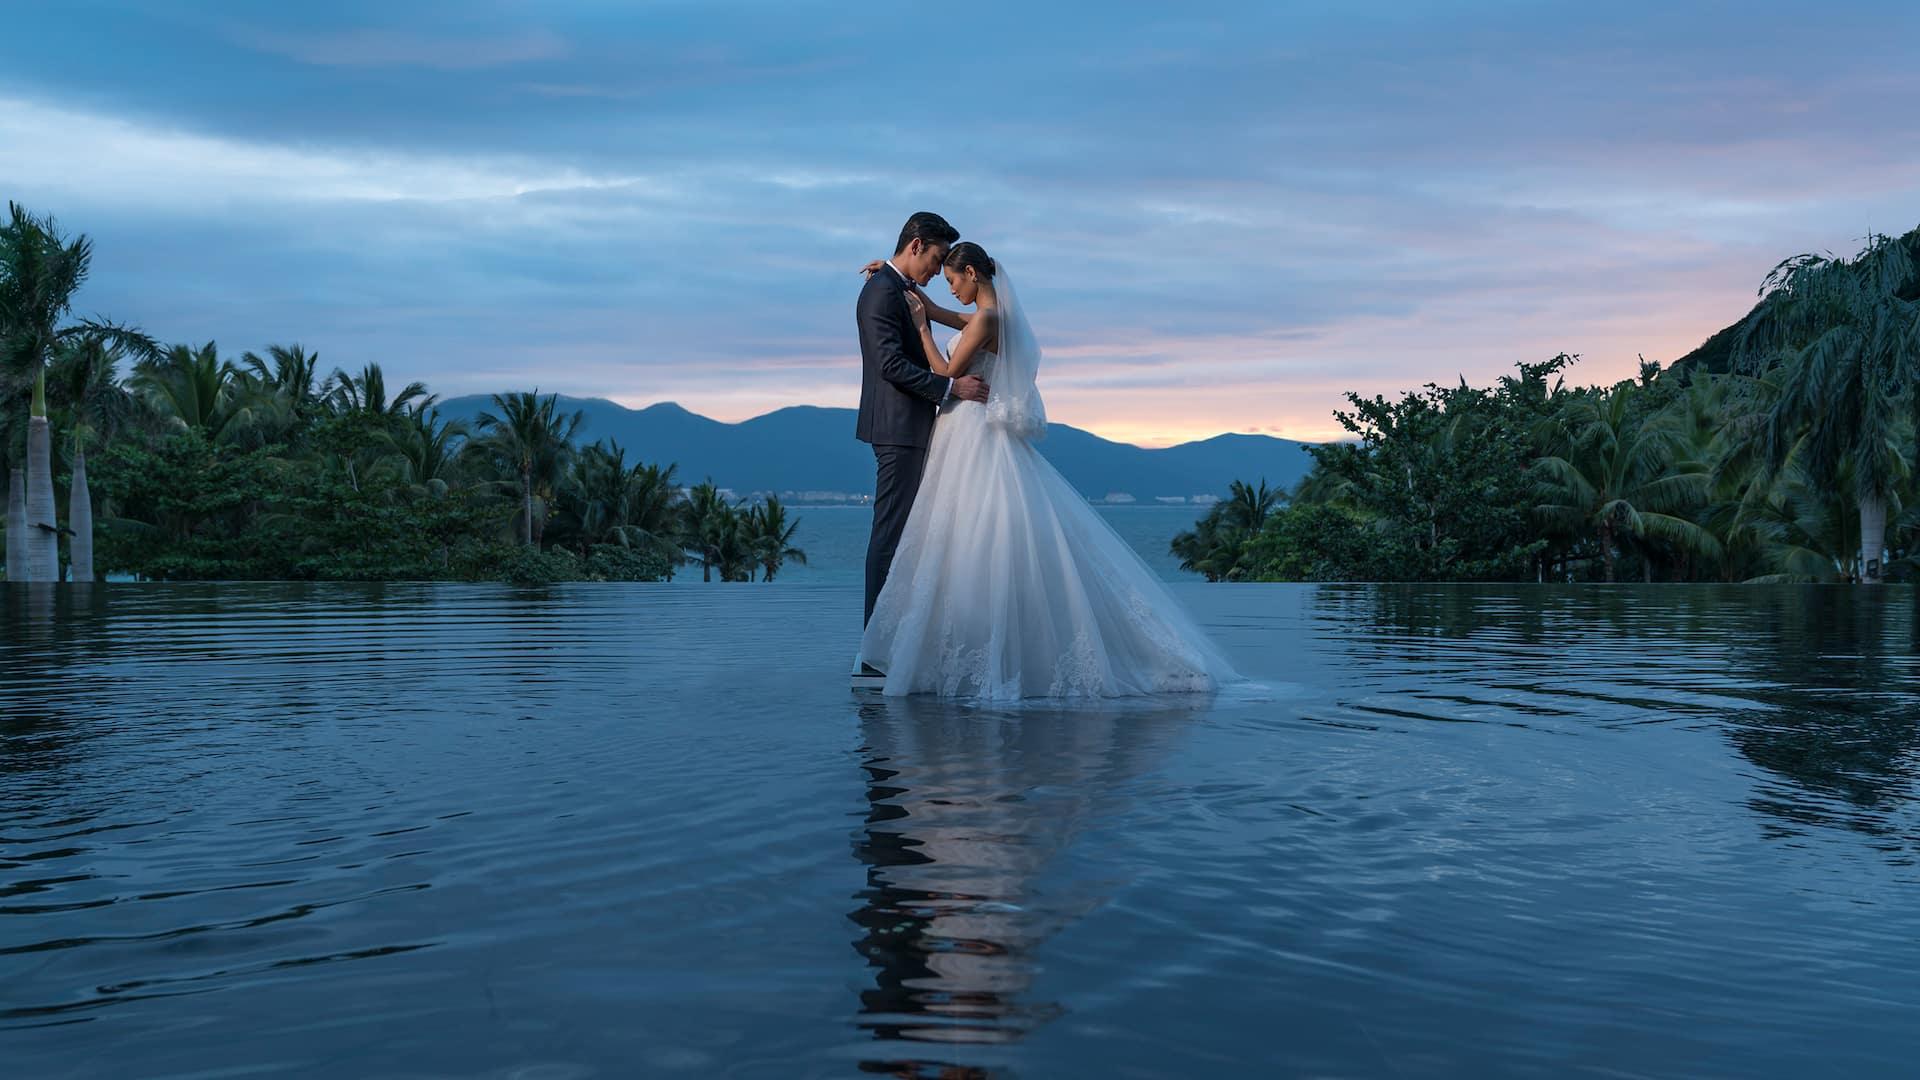 Park Hyatt Sanya Romantic Moment Wedding